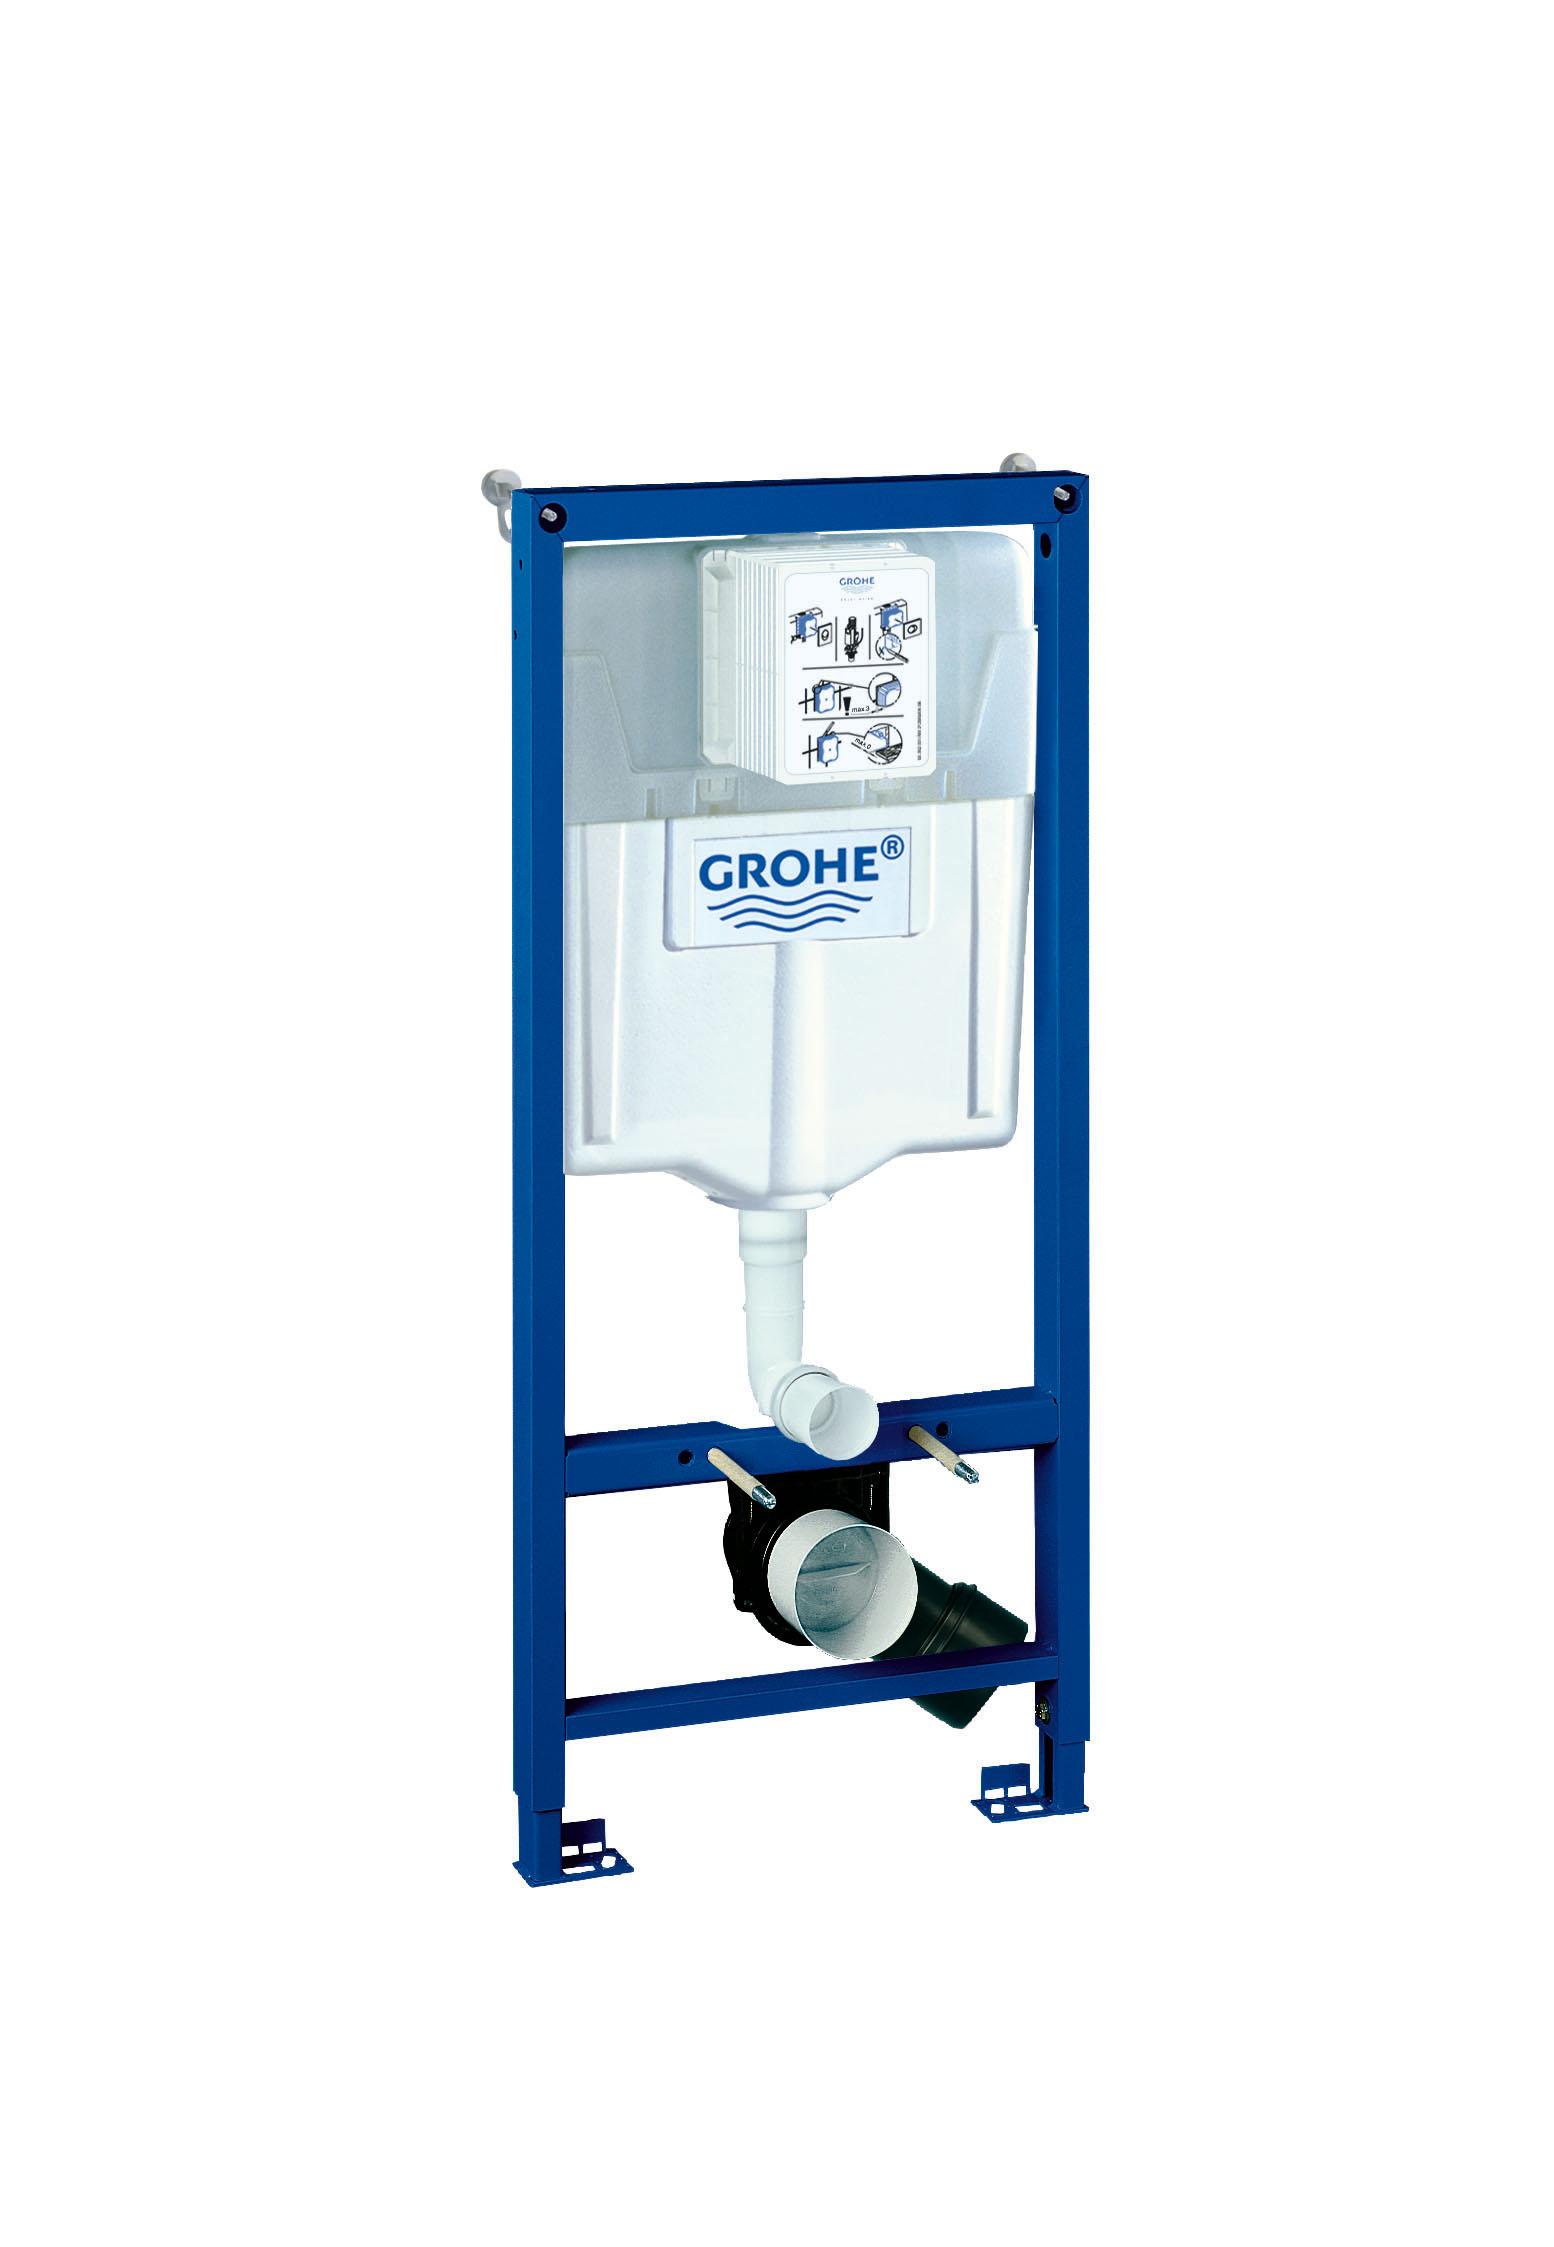 Система инсталляции для унитаза GROHE Rapid SL (1,13 м) (38536001) - Сантехника и санфаянс